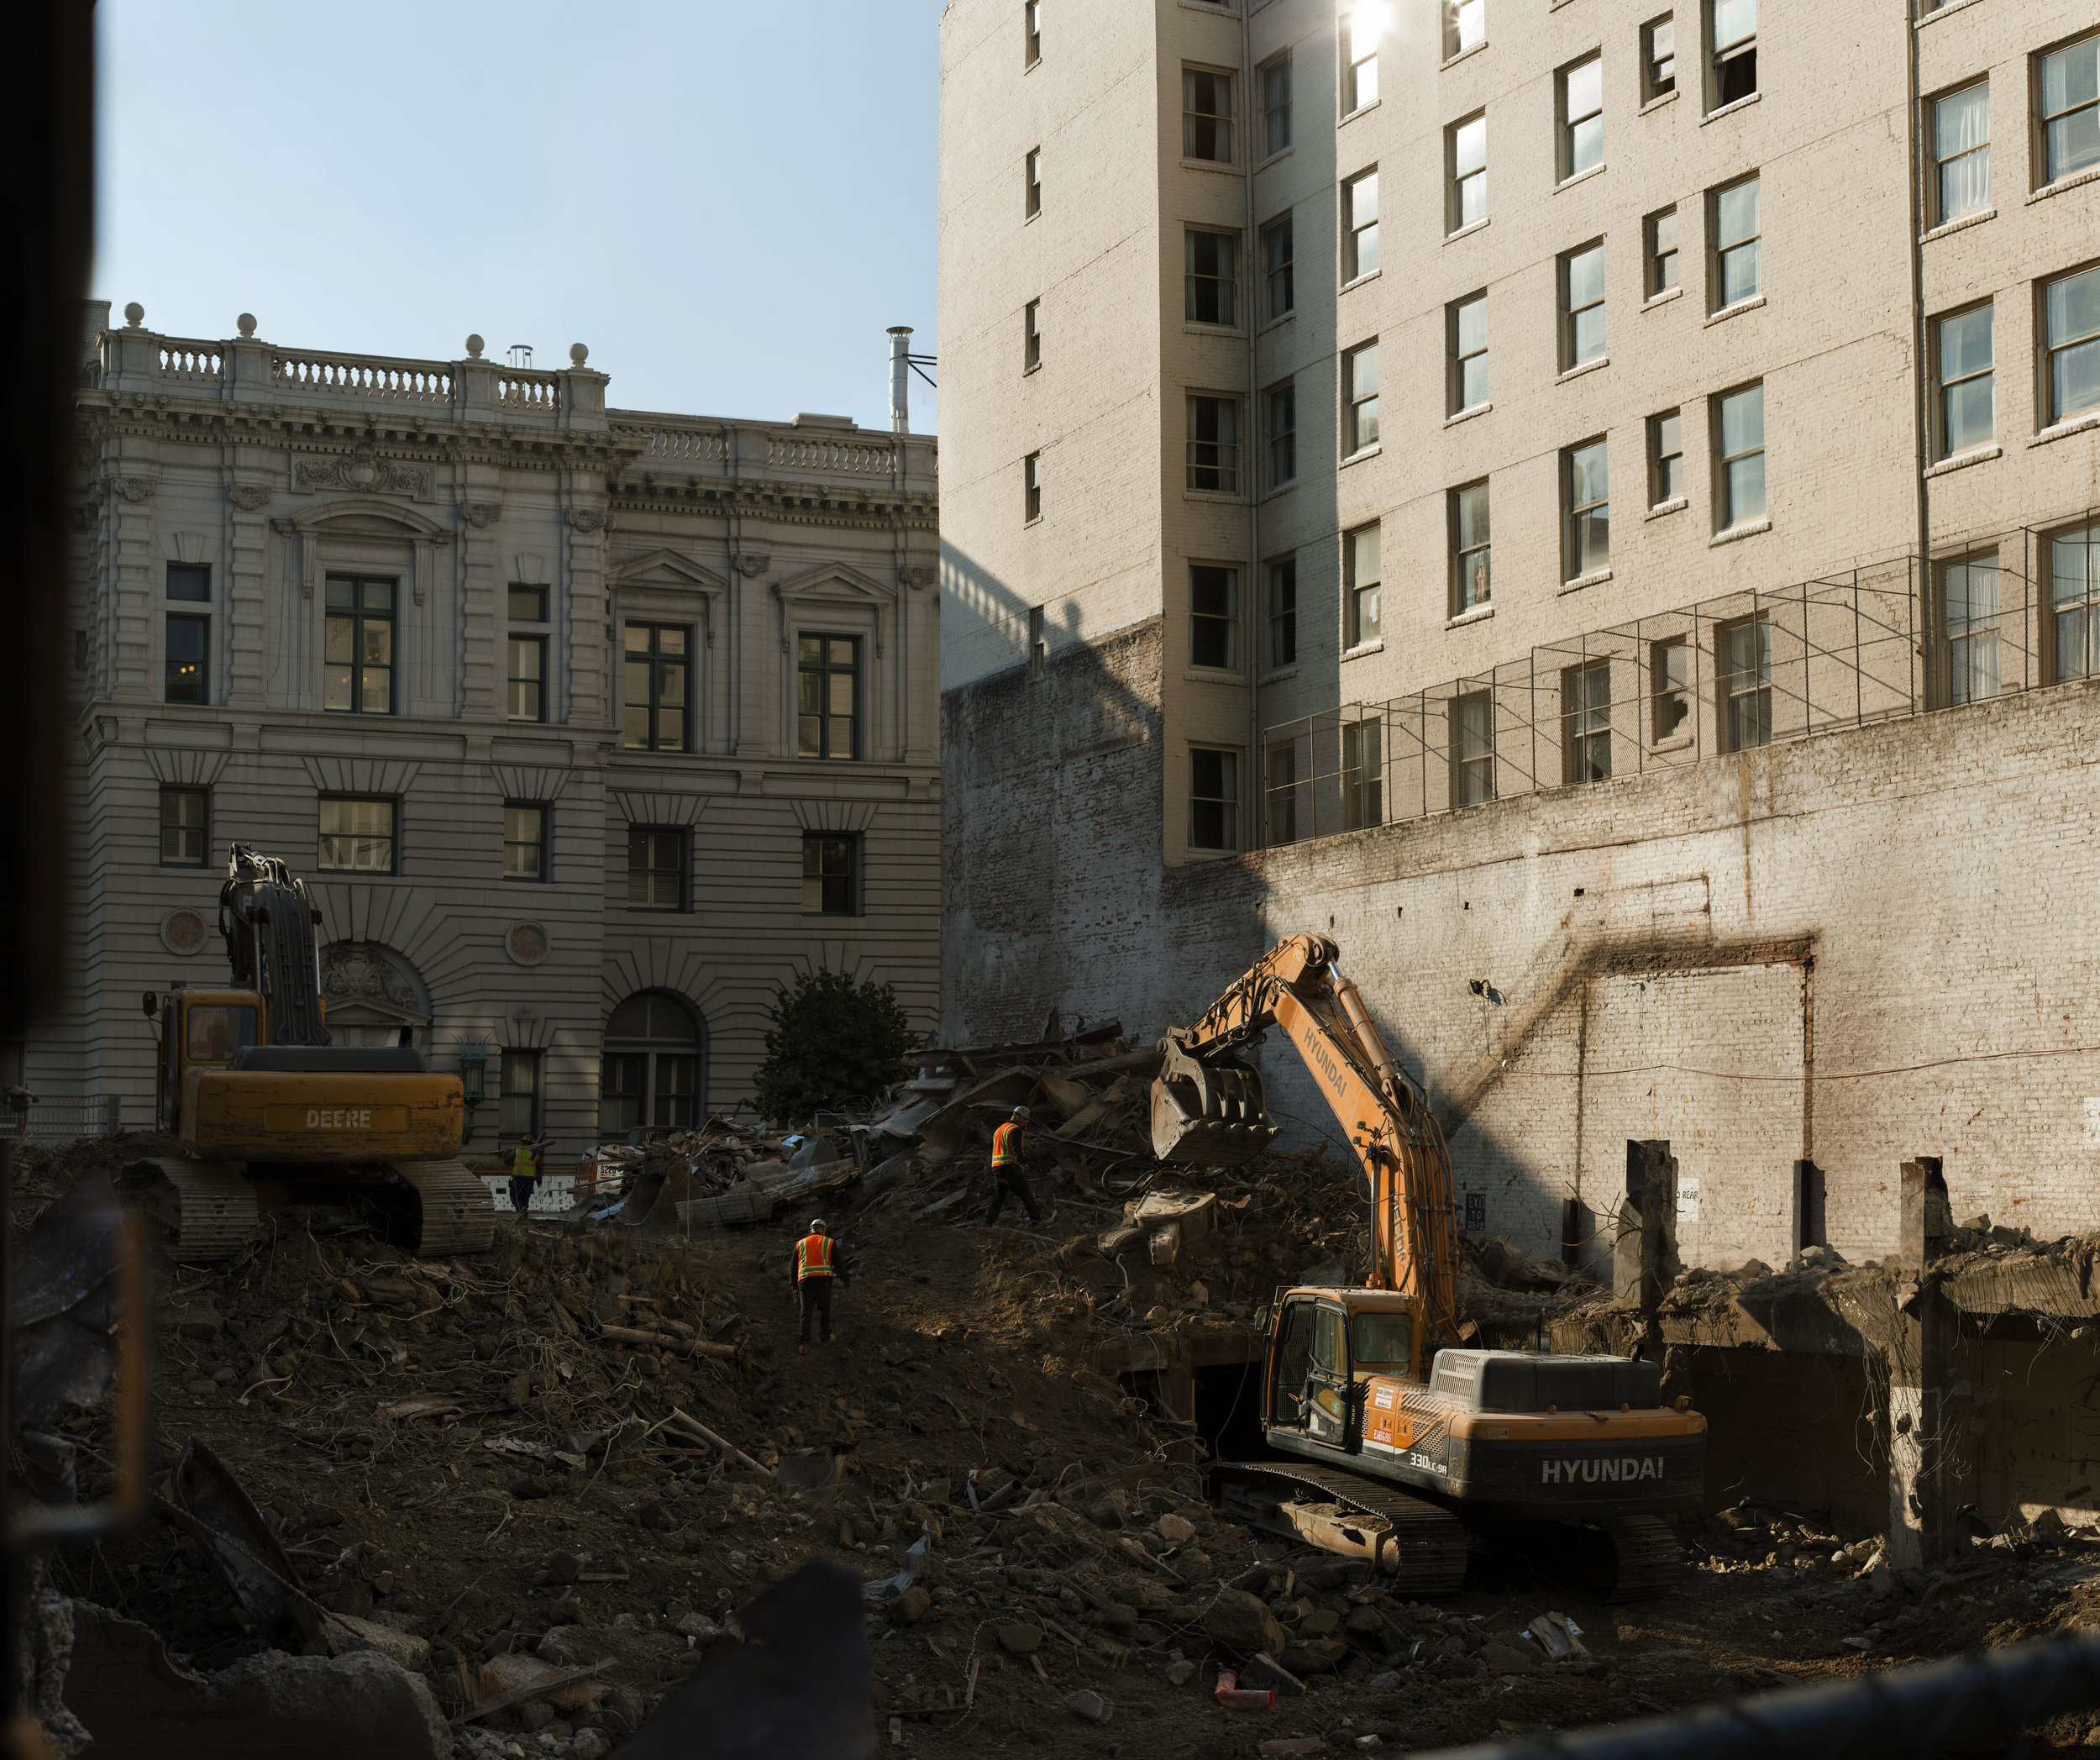 San_Francisco_In_Ruins-CarlyCram